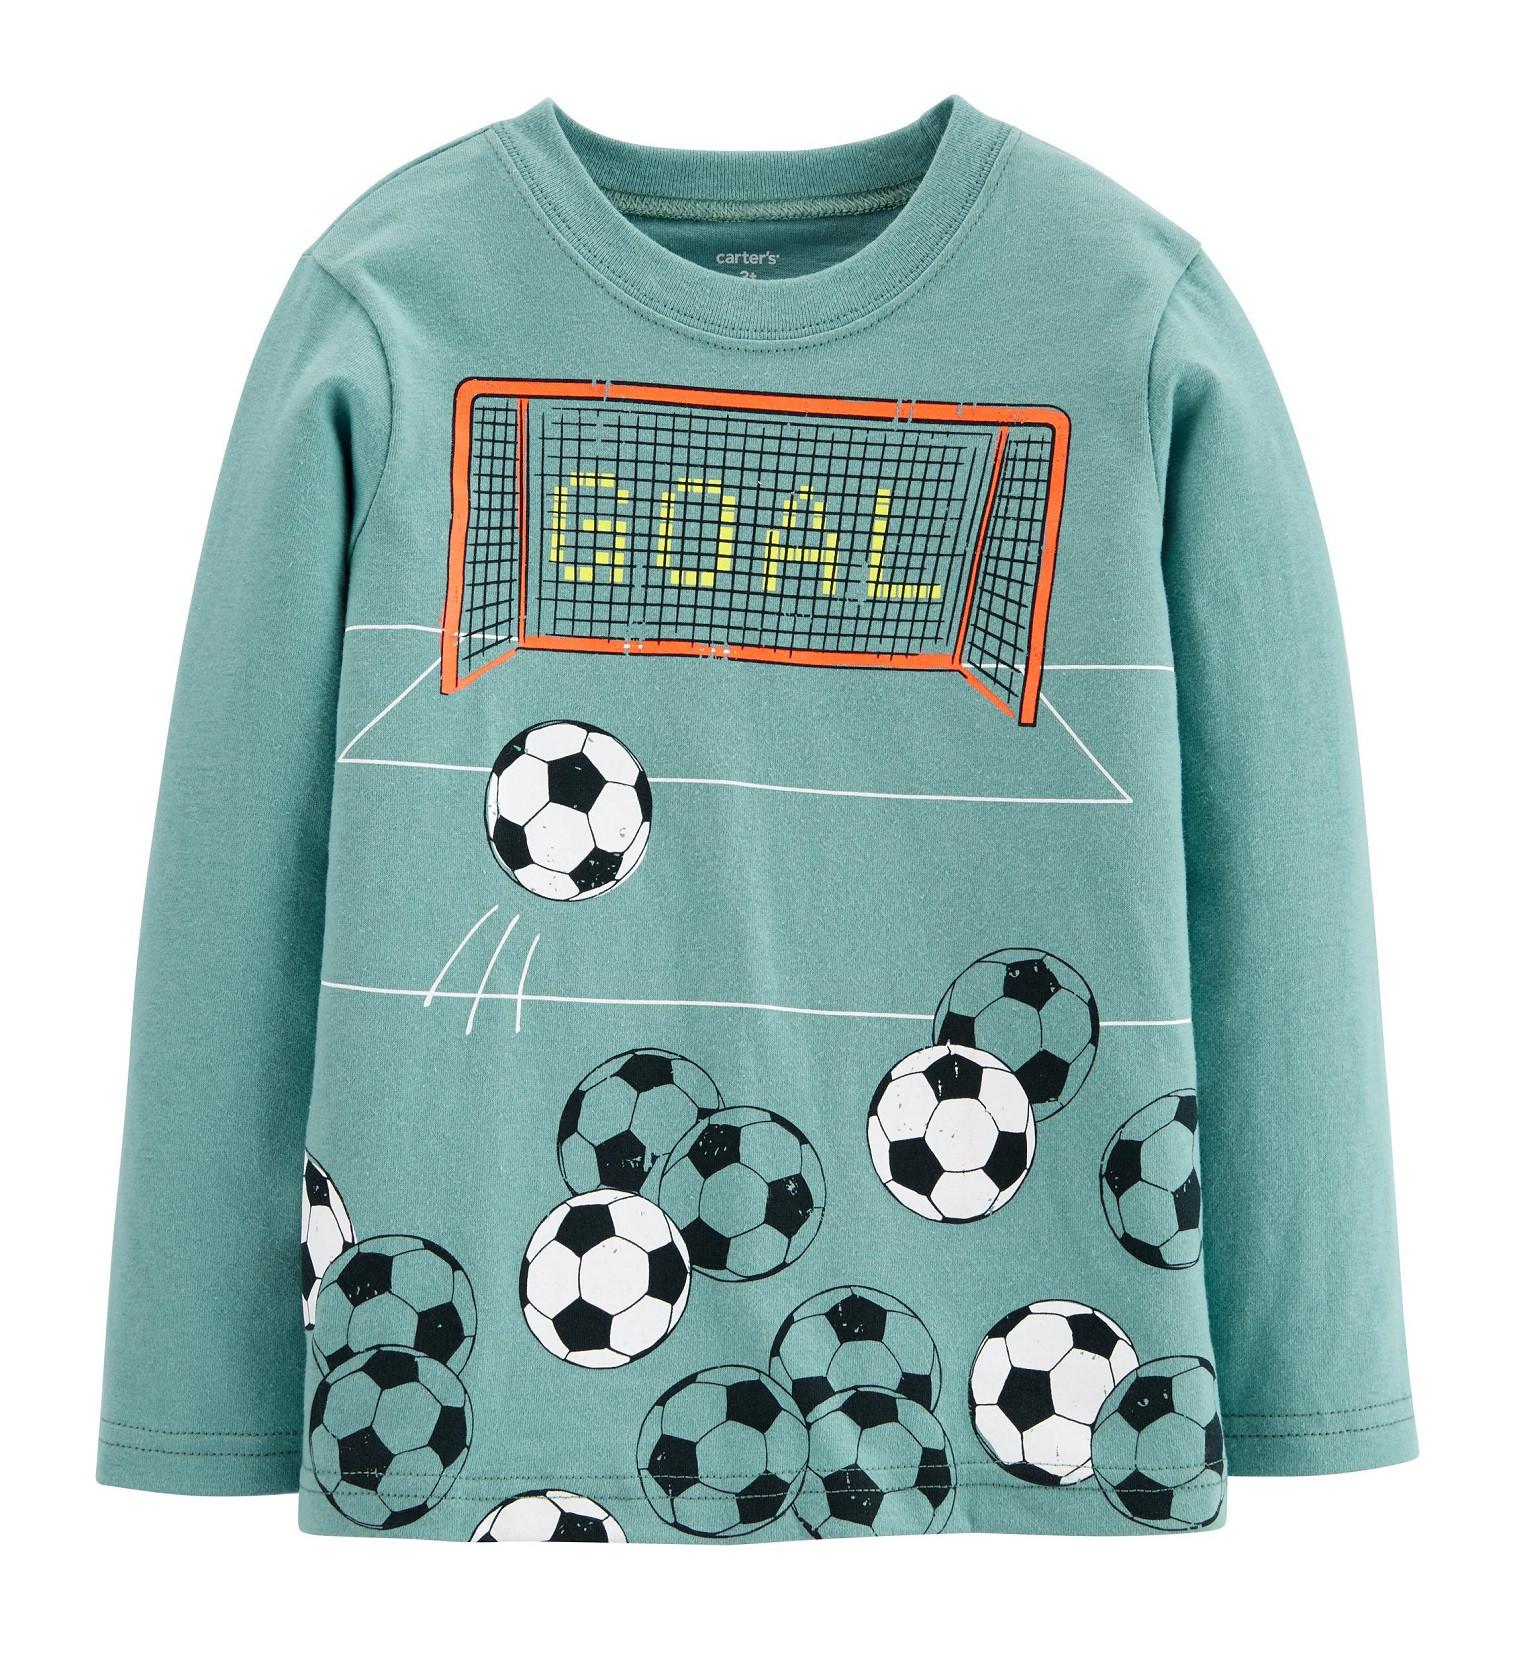 Купити Реглан Carters Soccer Teal - фото 1